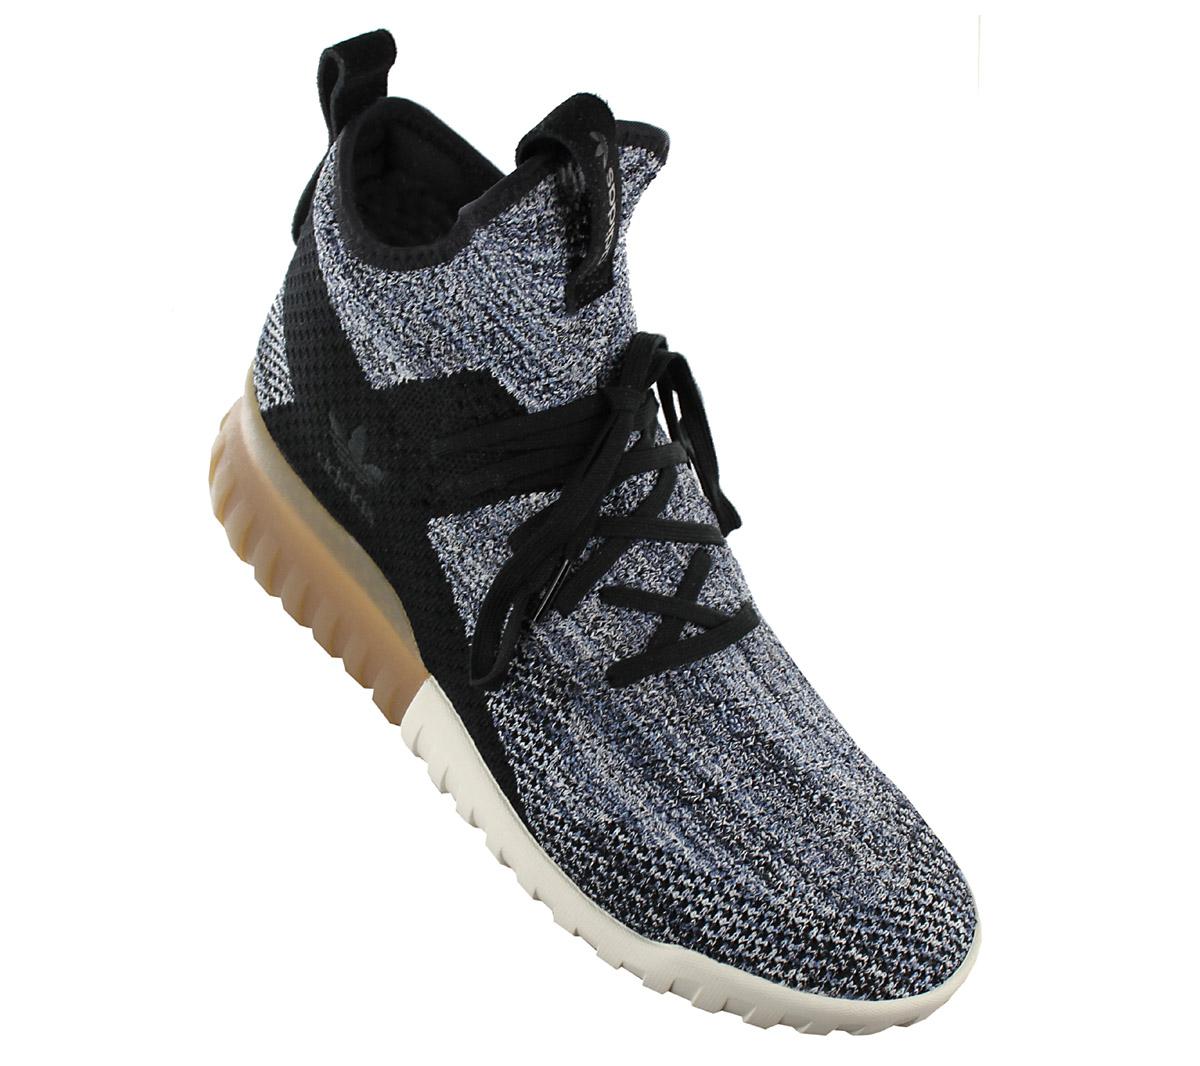 8ed3b6276d8e Adidas Tubular x Pk Primeknit Sneaker Men s Shoes Black Grey BY3145 ...